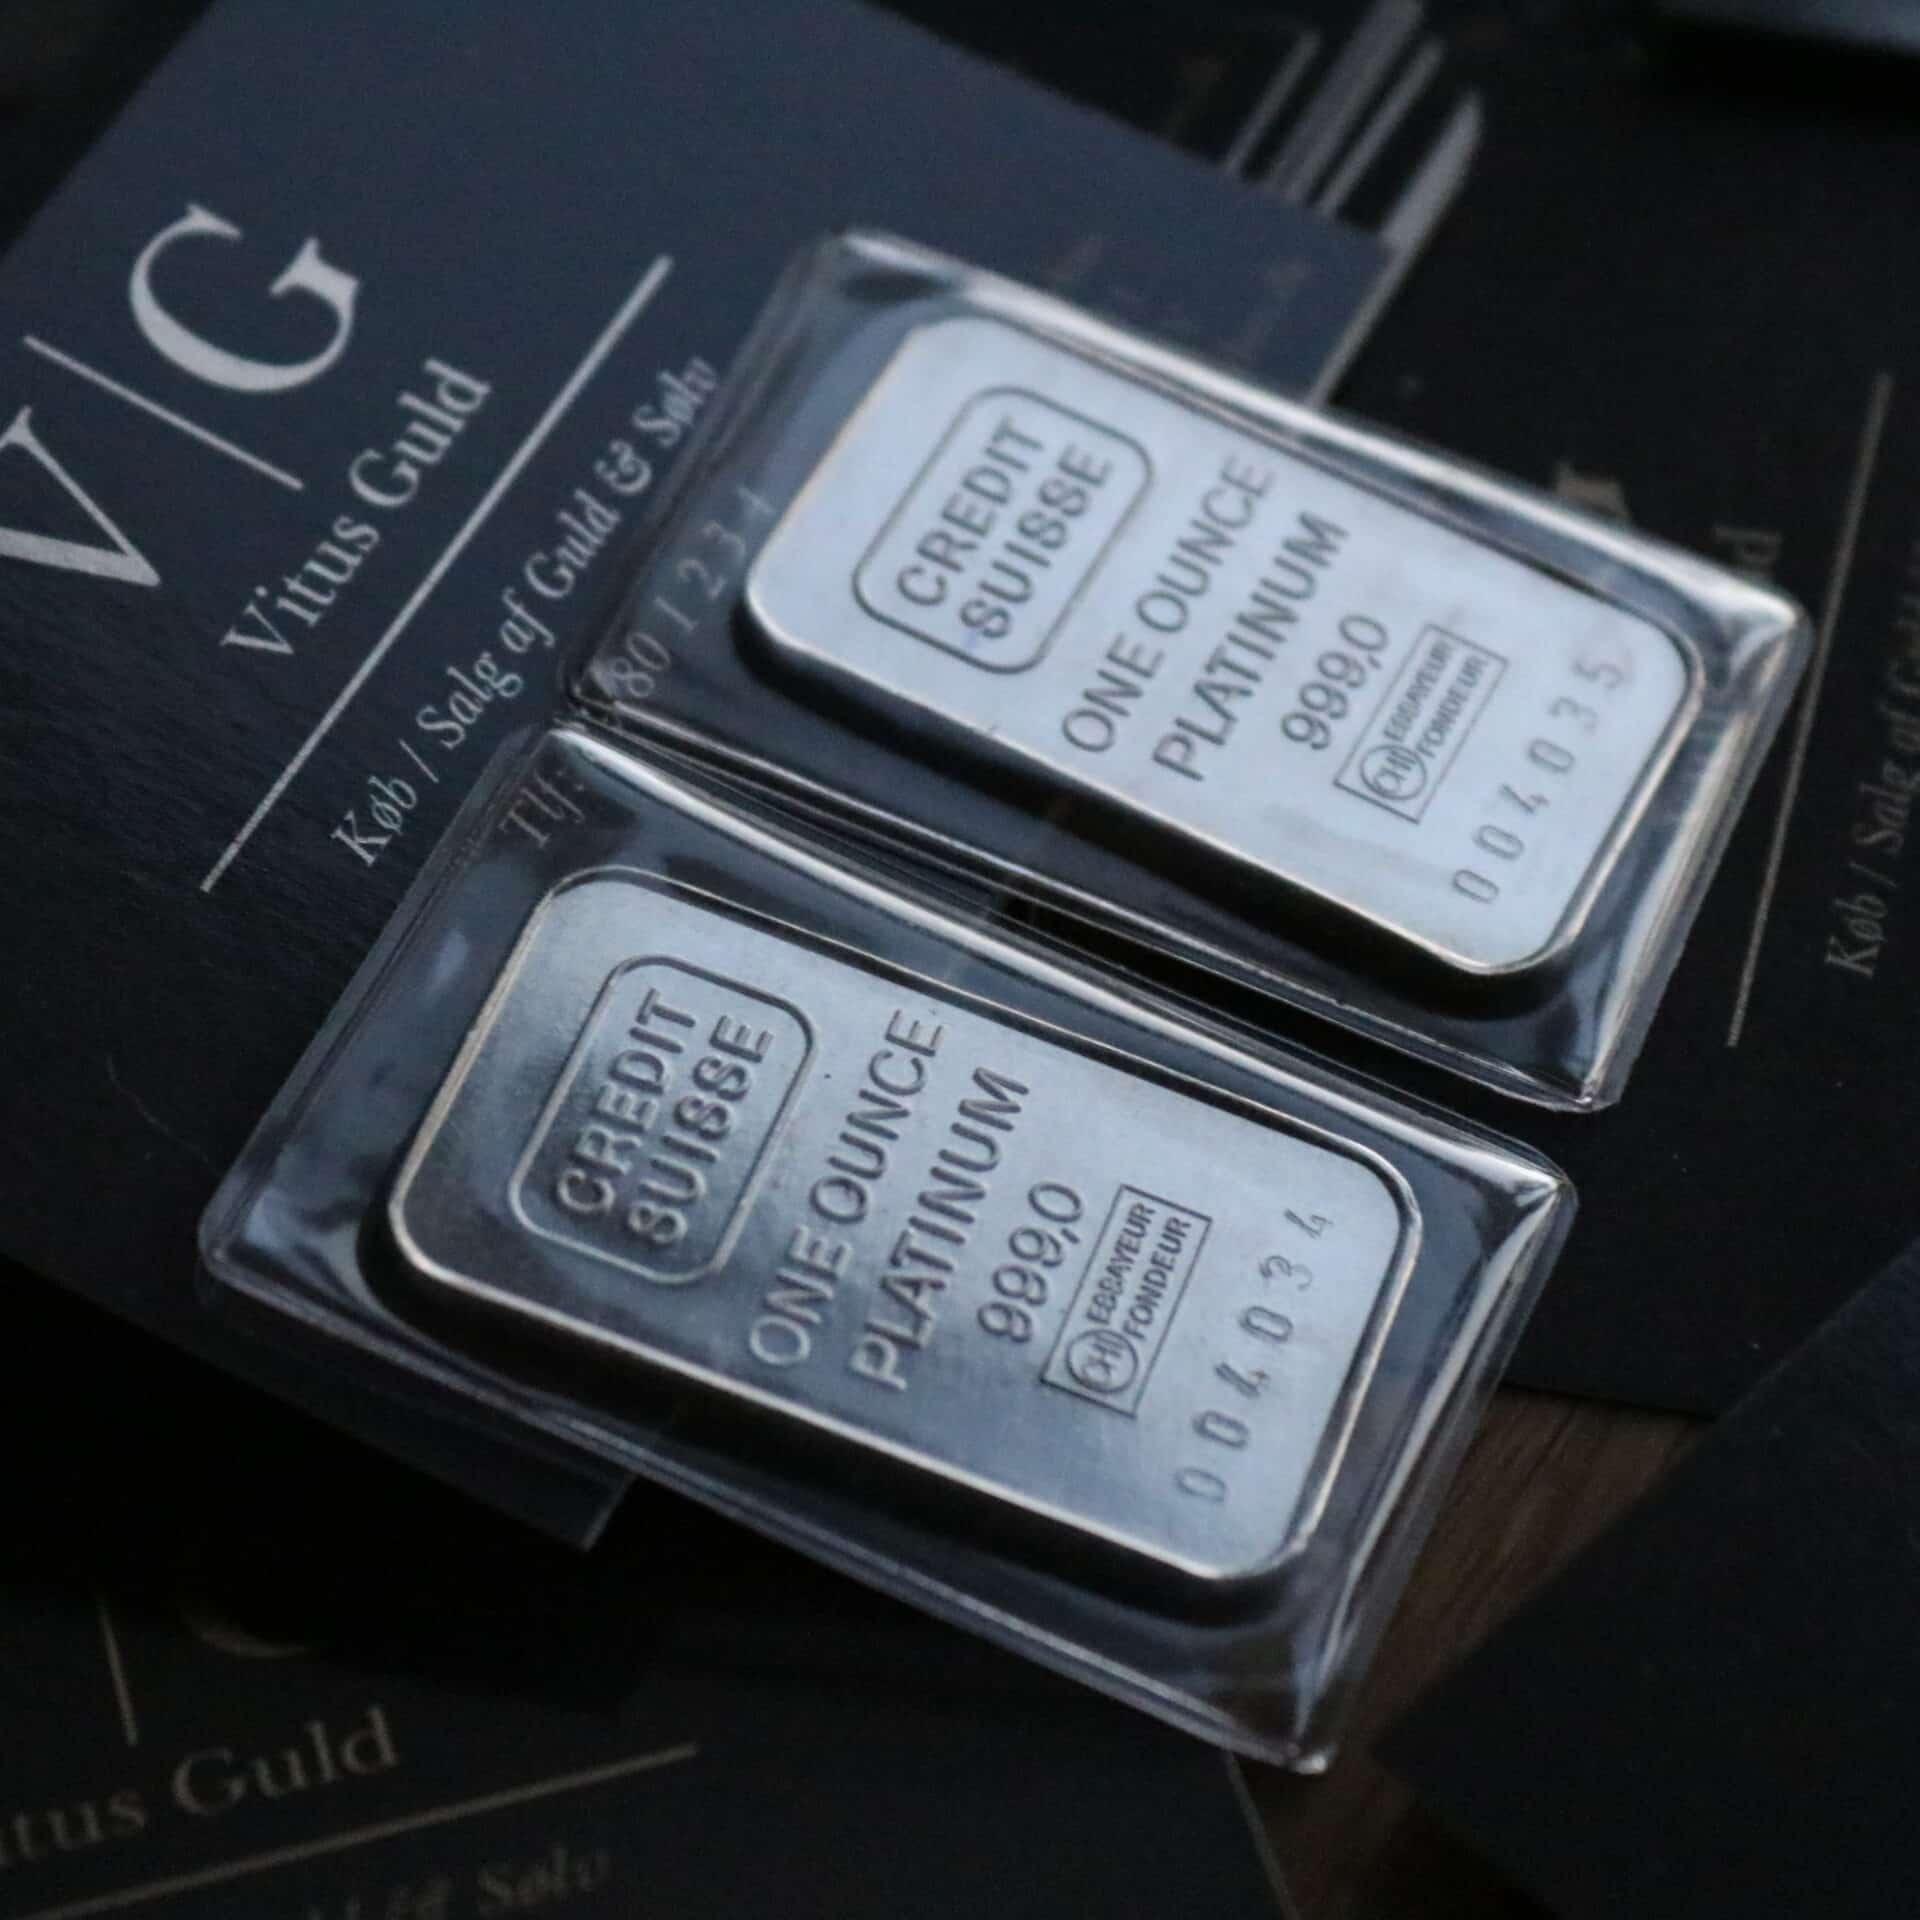 d7a8d71b19e TILBUD - 1 Oz Platin Bar 999,0 ‰ - Credit Suisse - Vitus Guld